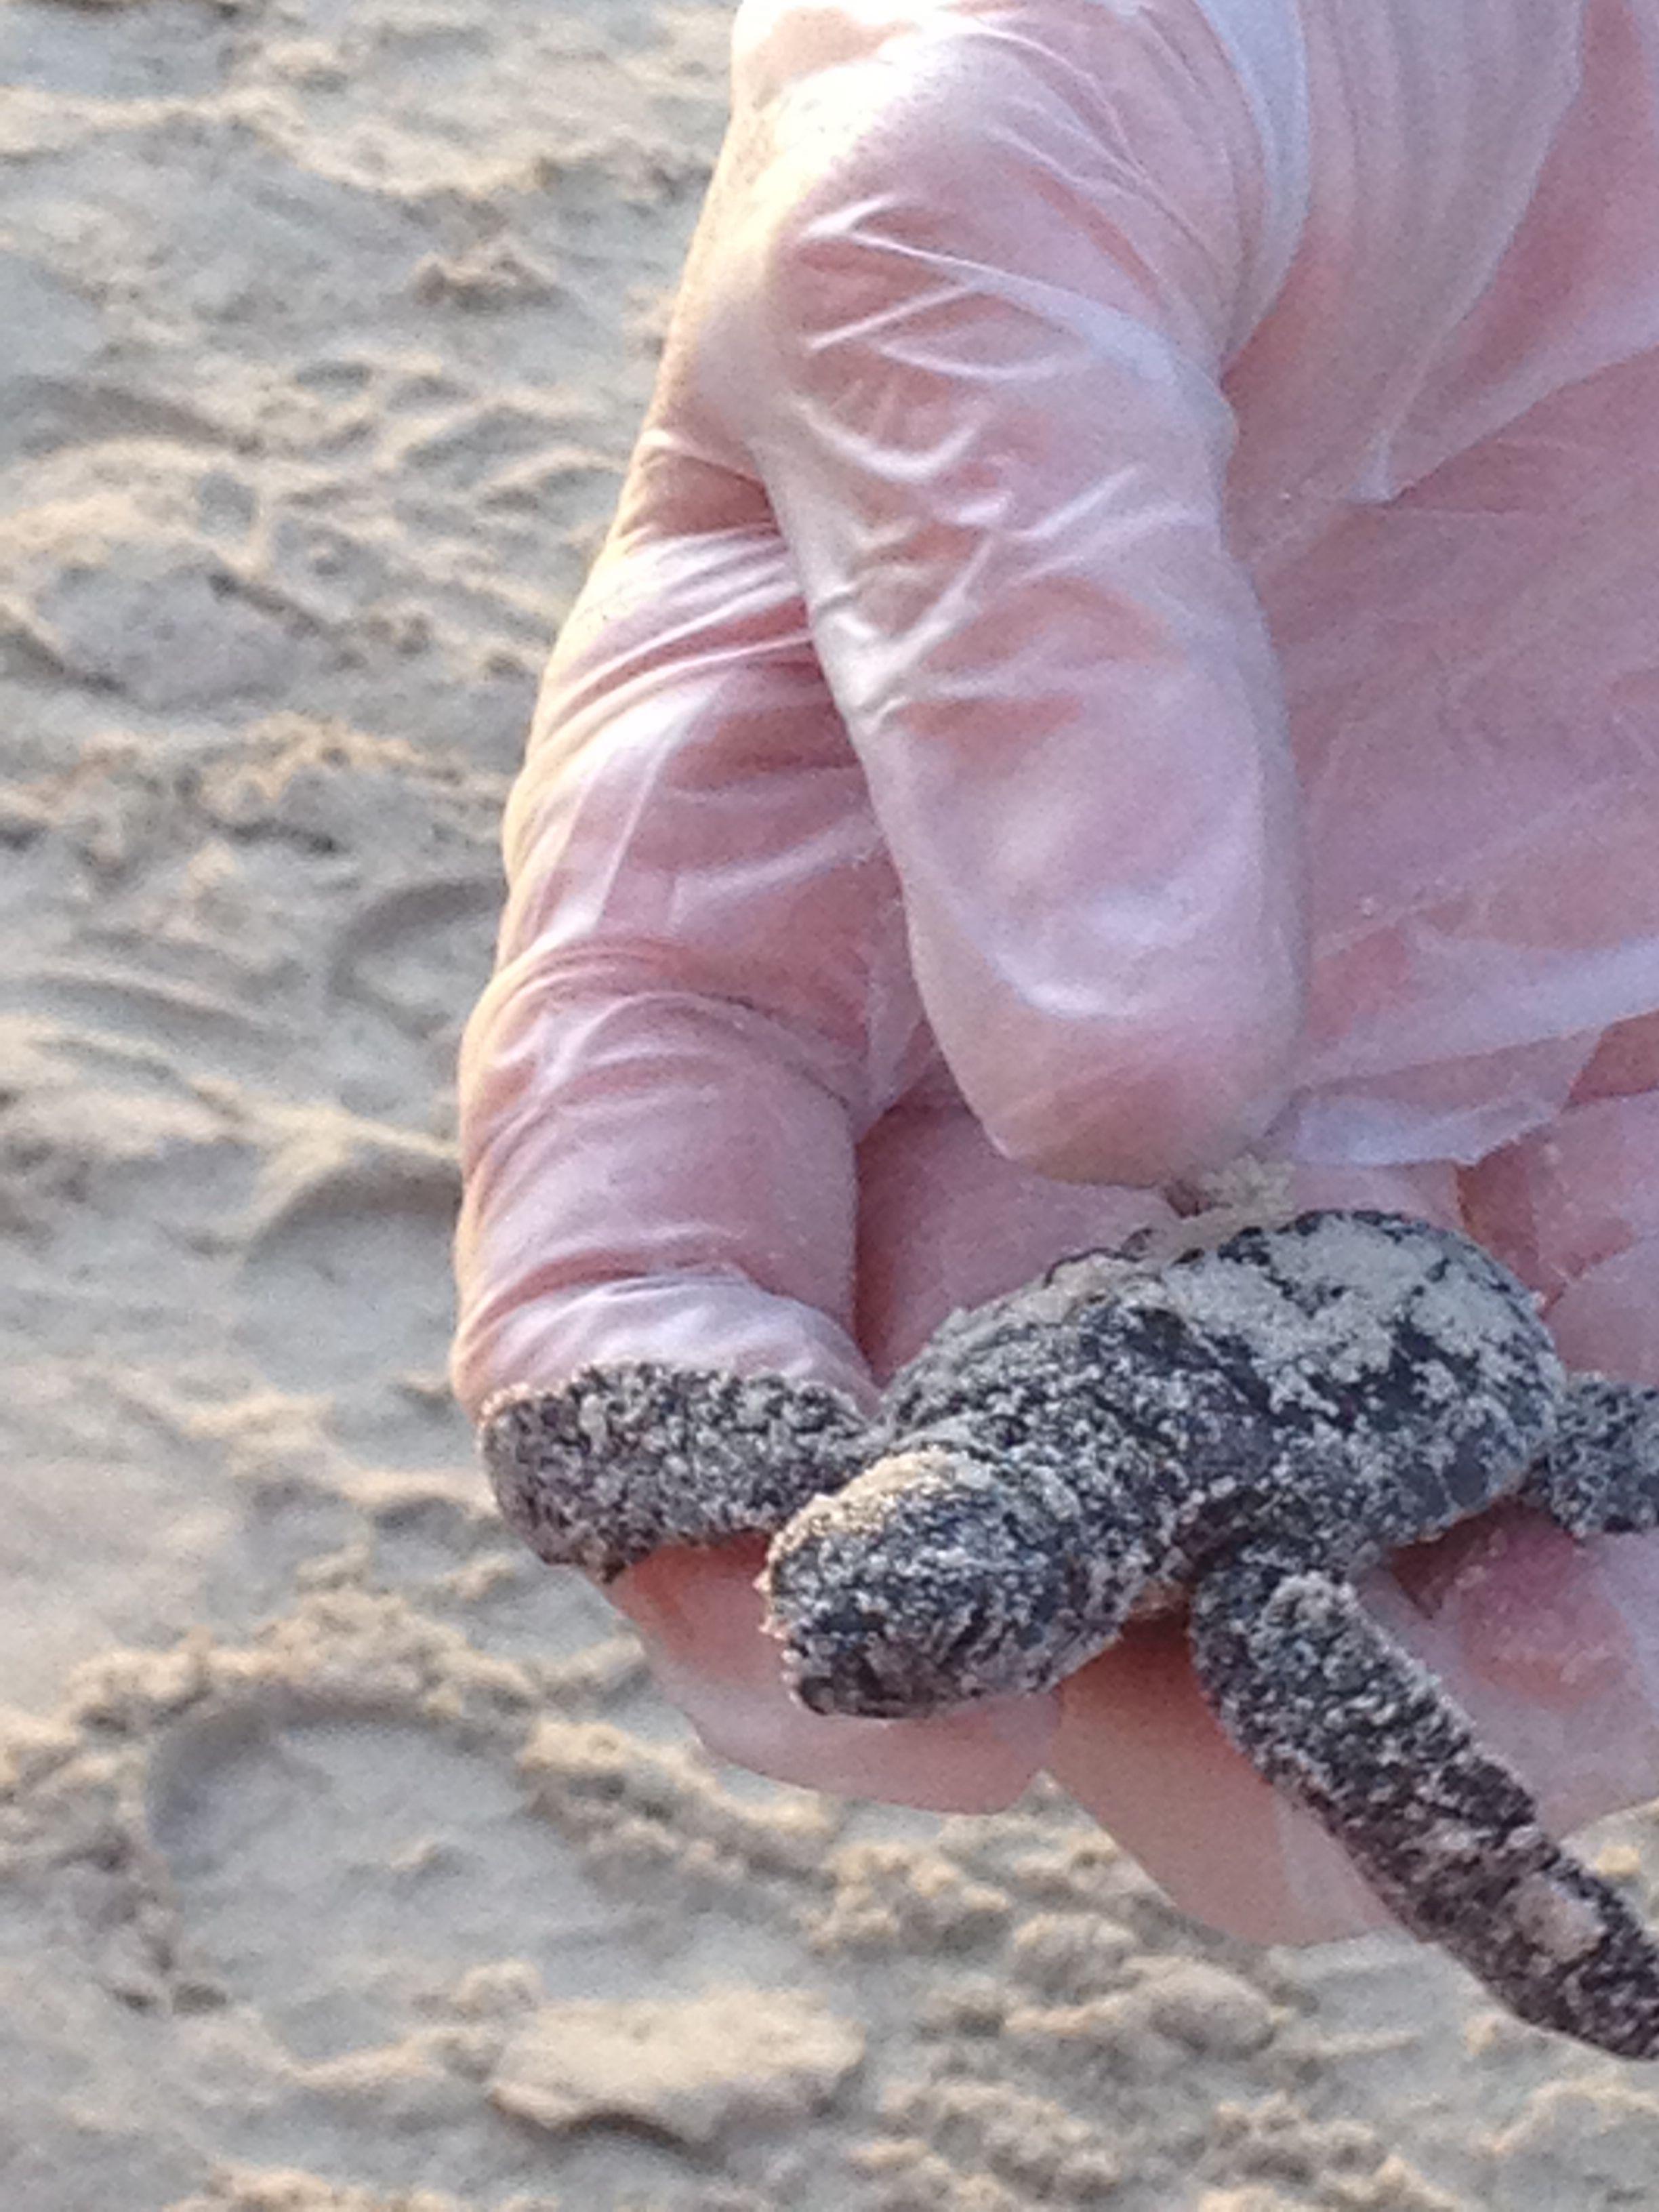 Pin By Vicci Rollins On Port Aransas Beach House Rental Sites And Sandfest Port Aransas Texas Port Aransas Texas Beaches